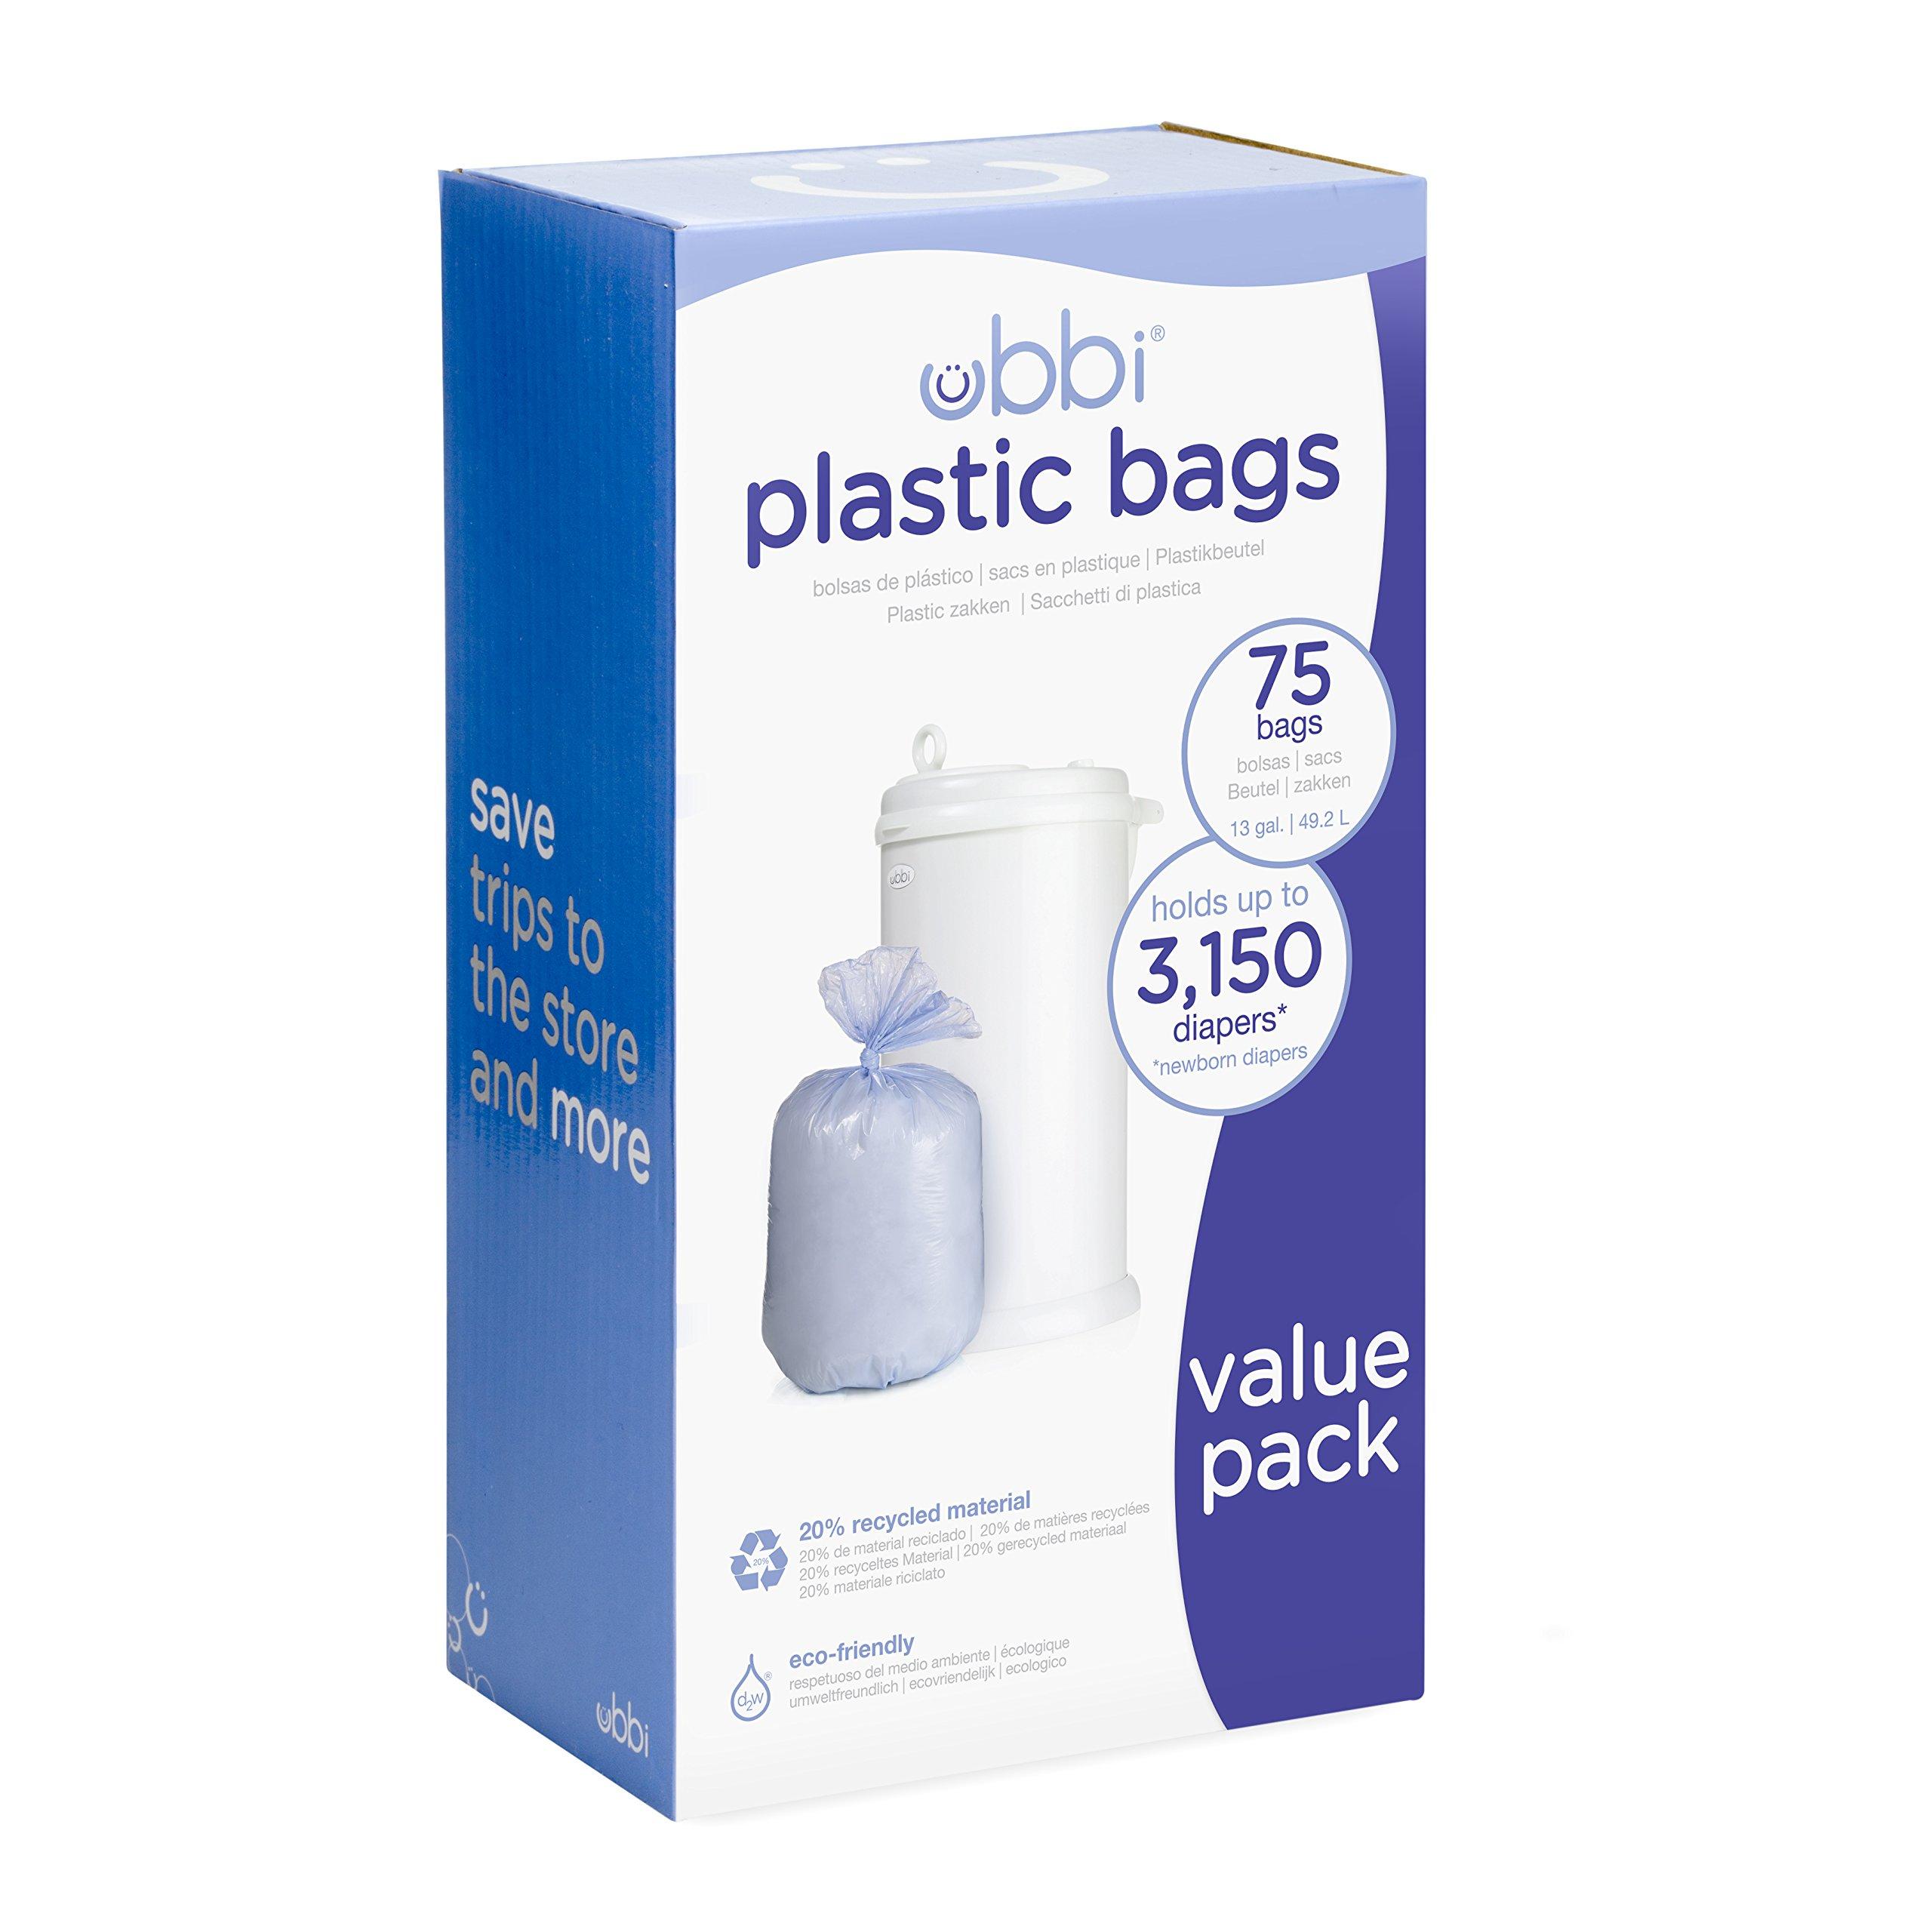 Ubbi Plastic Bags, 75 - Pack, 3 - Count by Ubbi